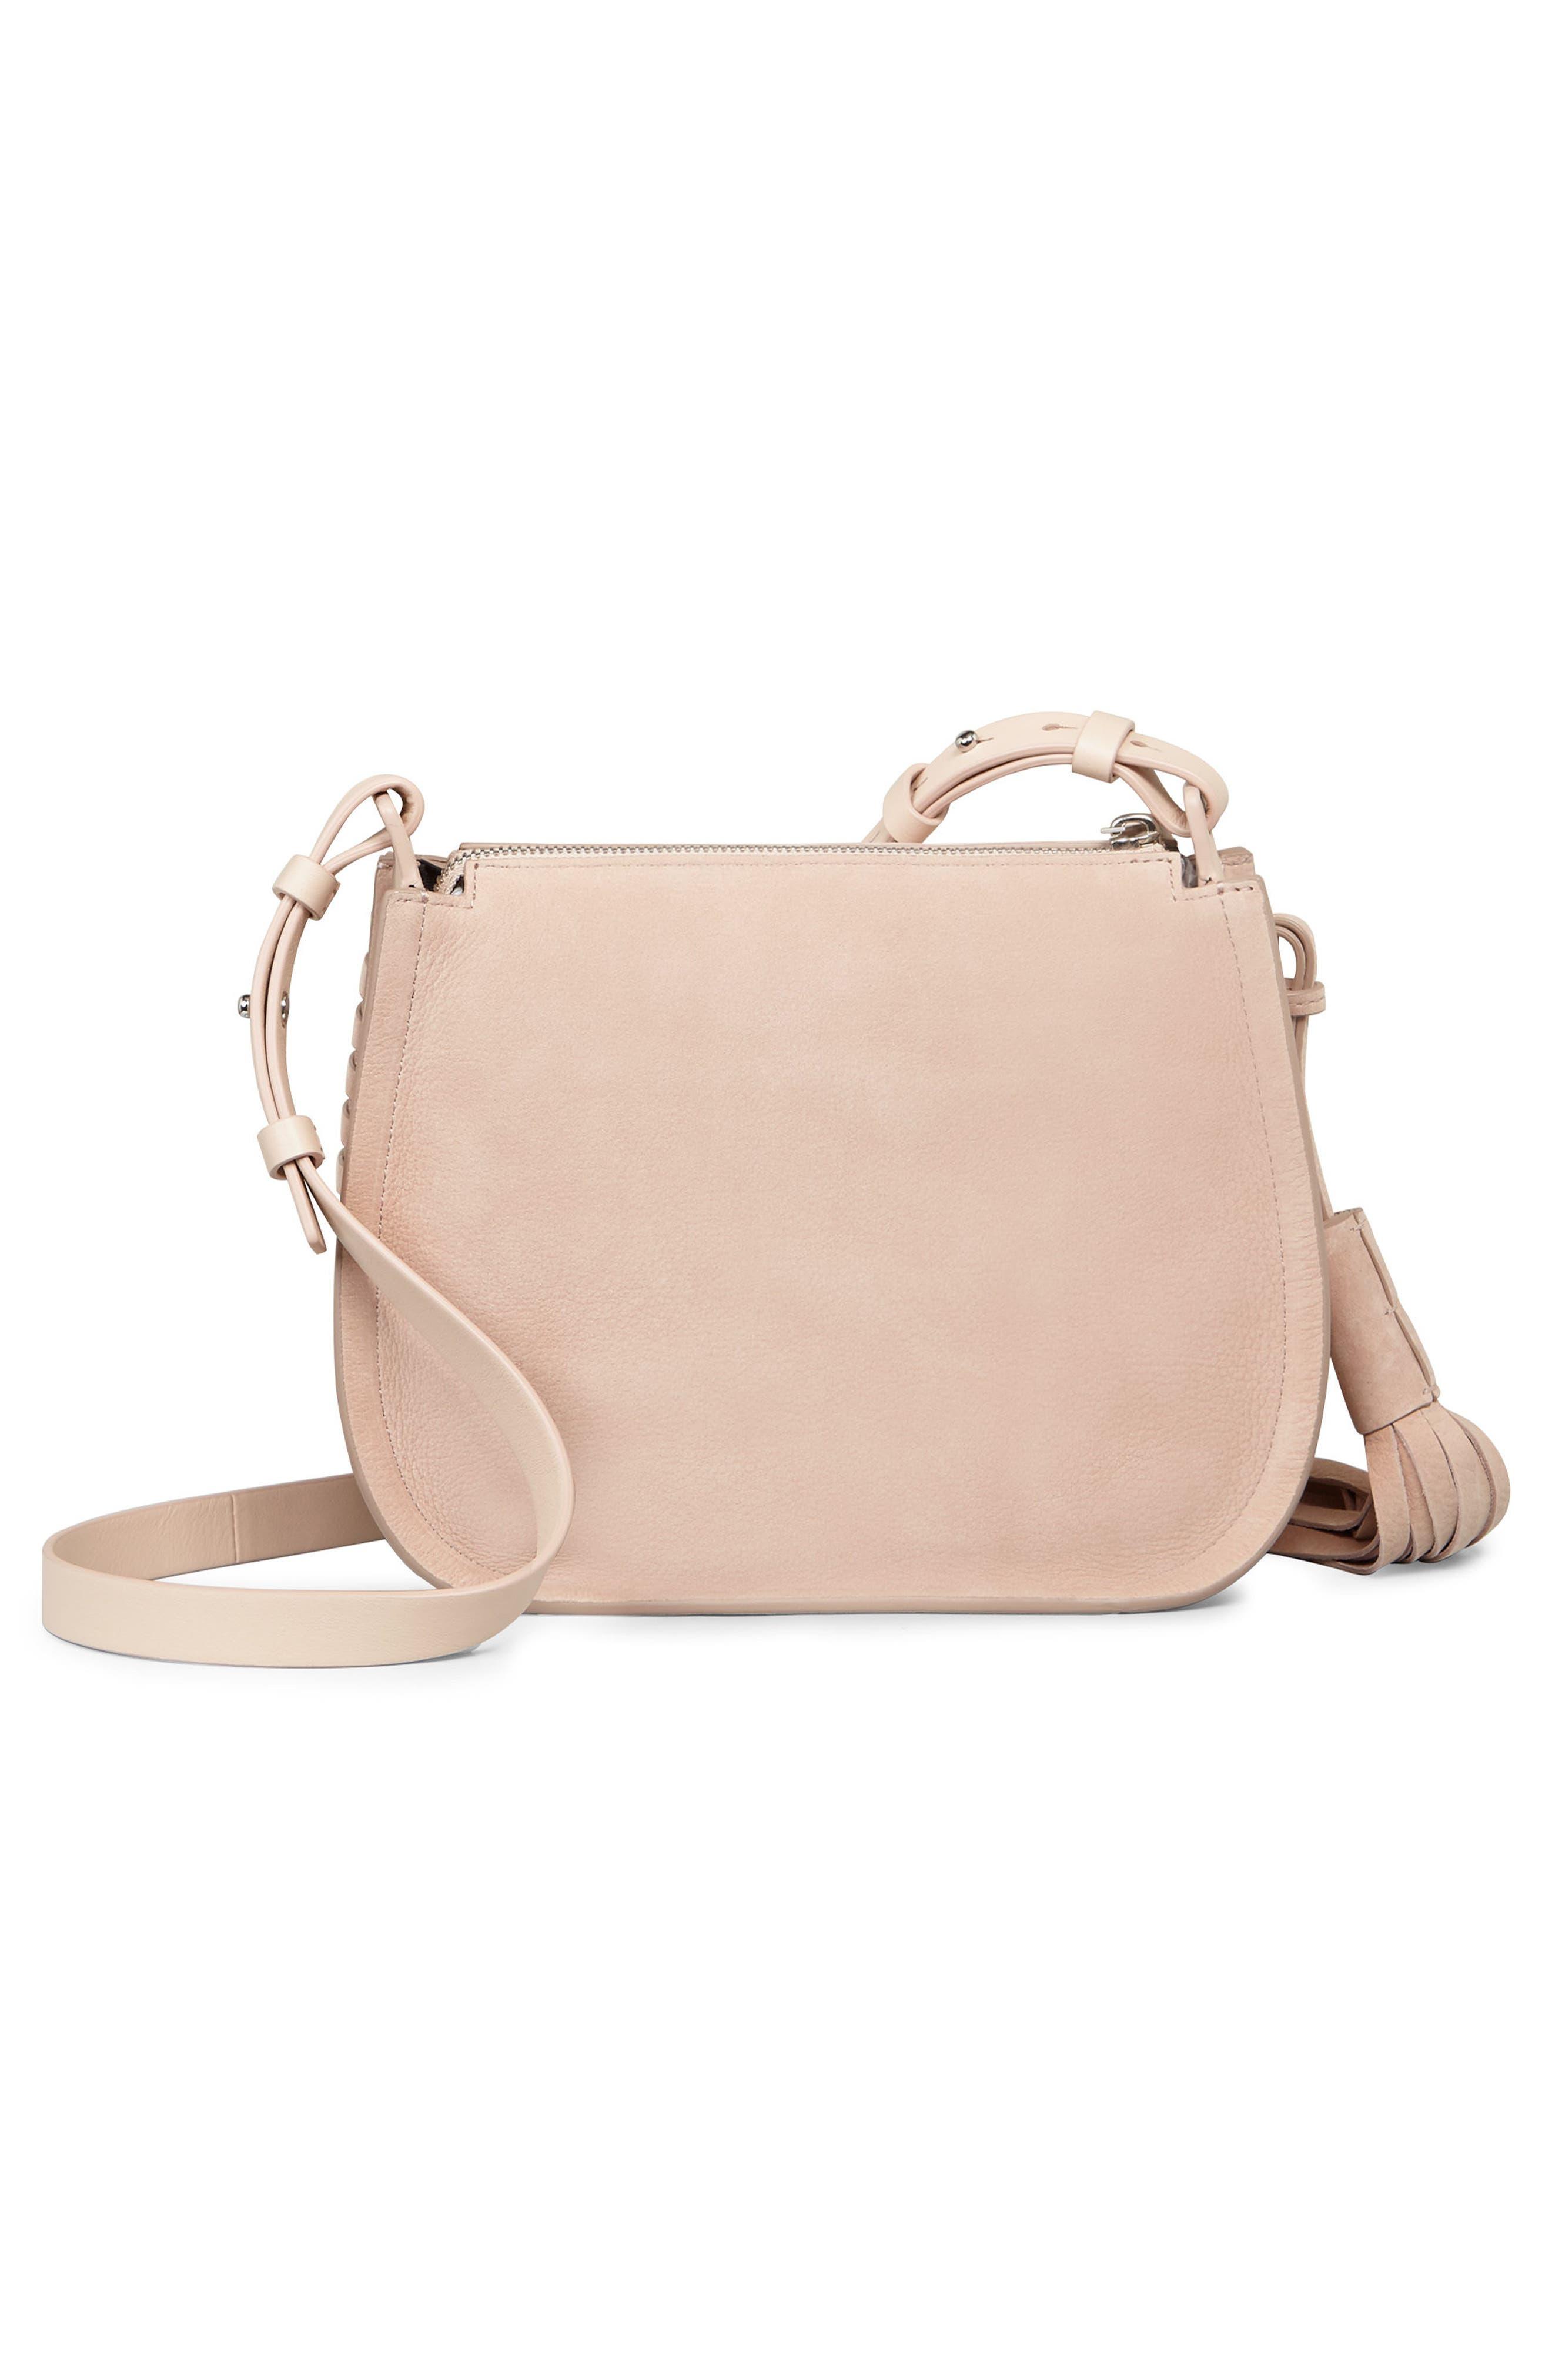 Mori Suede Crossbody Bag,                             Alternate thumbnail 3, color,                             Nude Pink